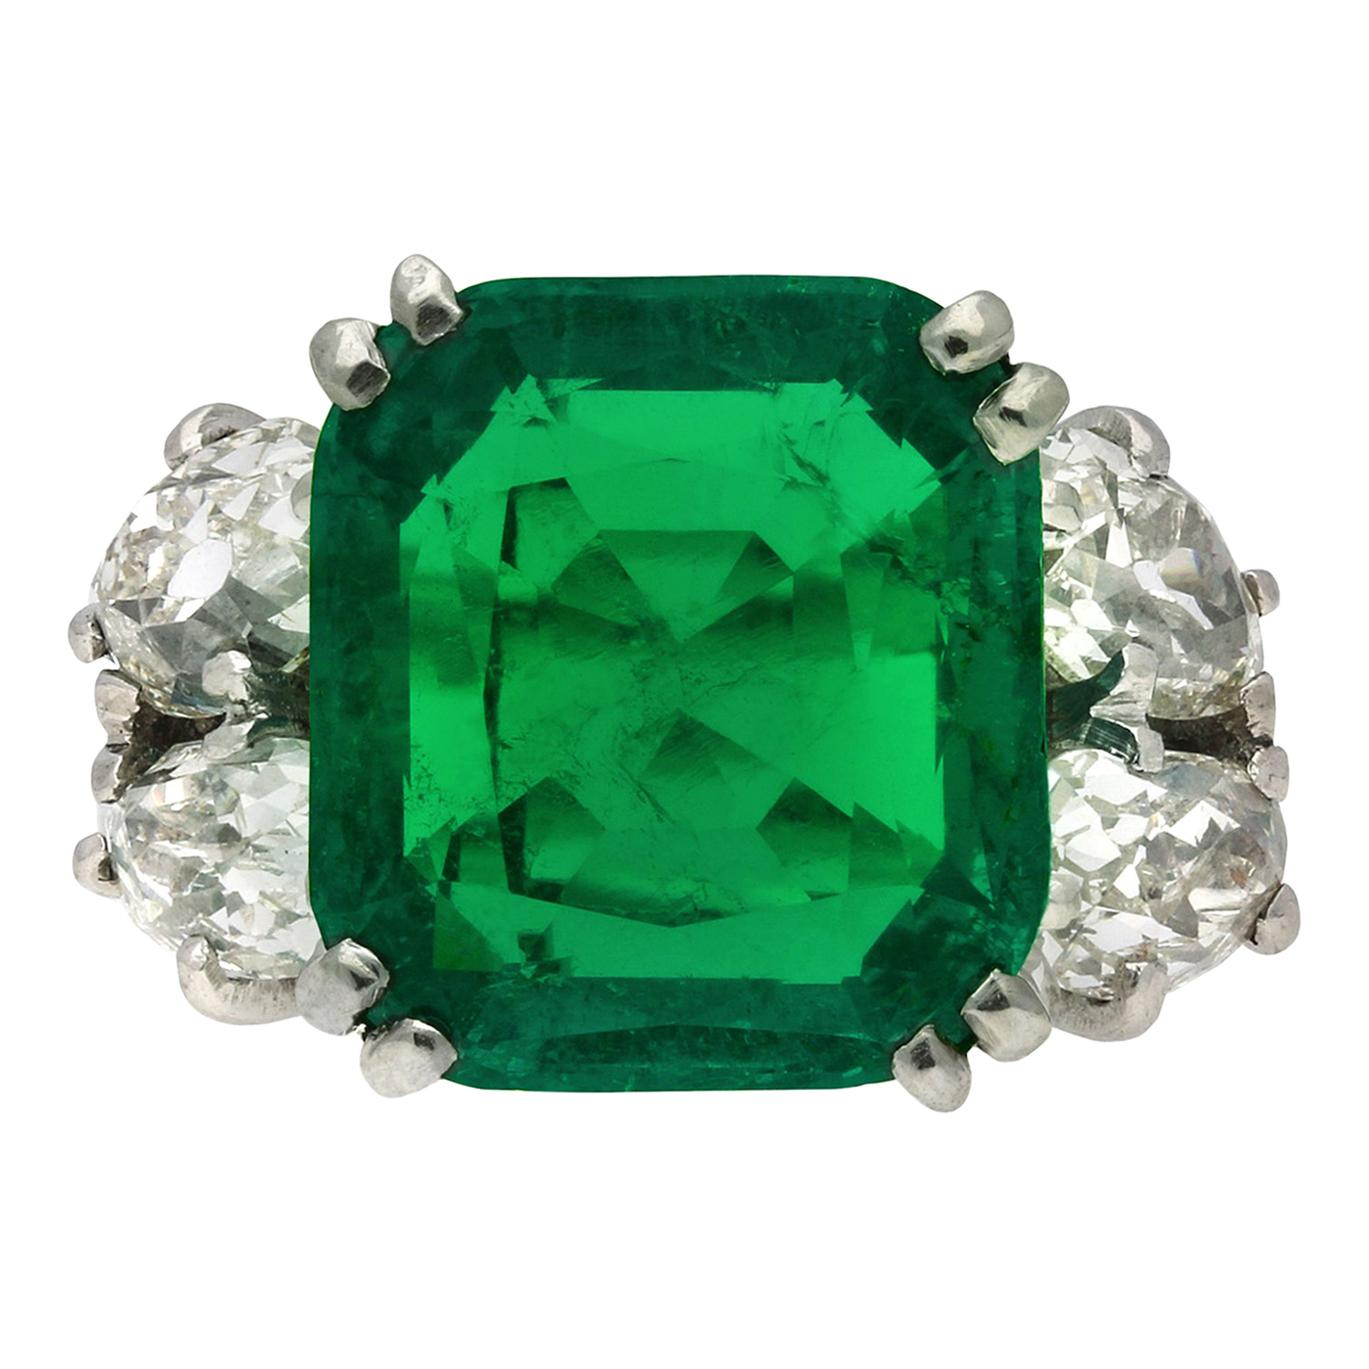 Boucheron Colombian Emerald and Diamond Ring, French, circa 1920